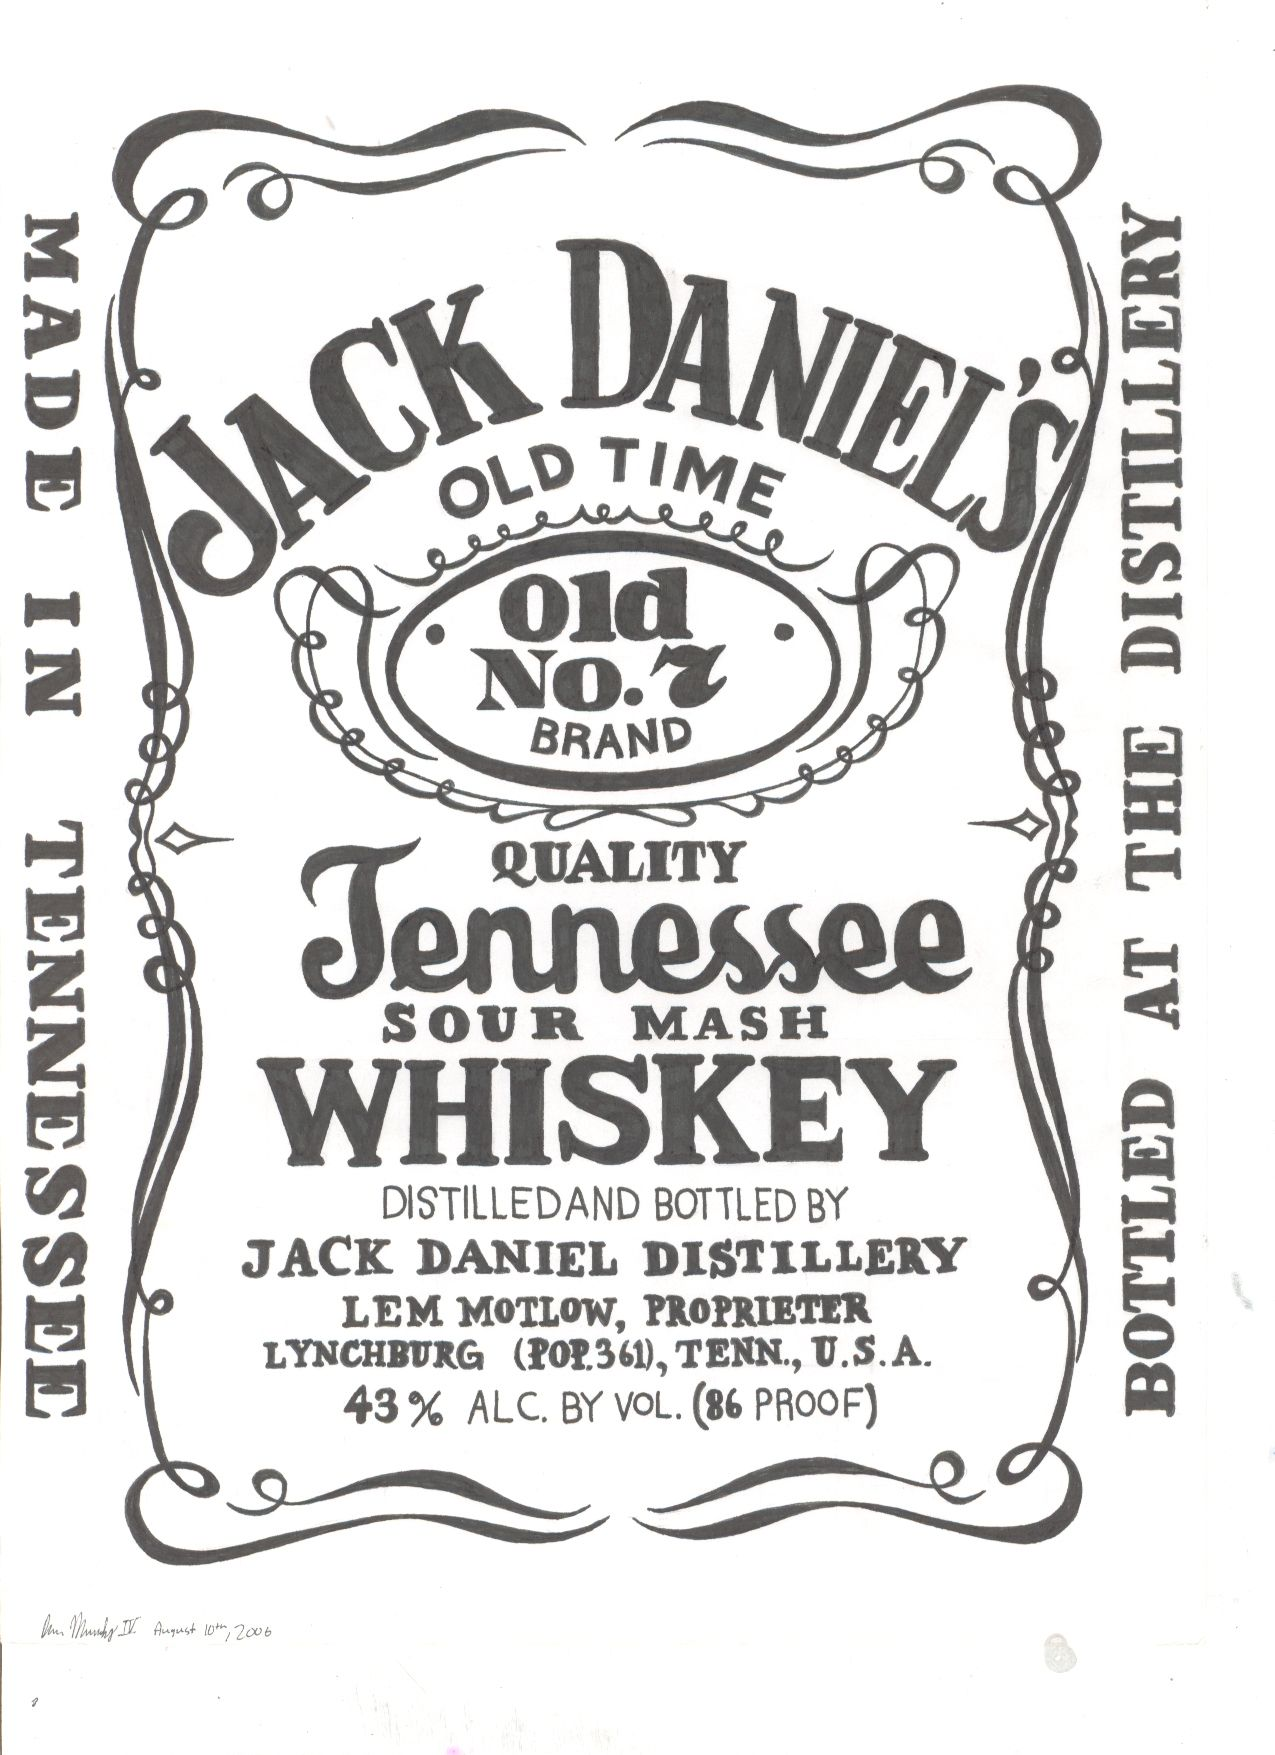 jack daniels logo stencil google search jack daniels pinterest. Black Bedroom Furniture Sets. Home Design Ideas